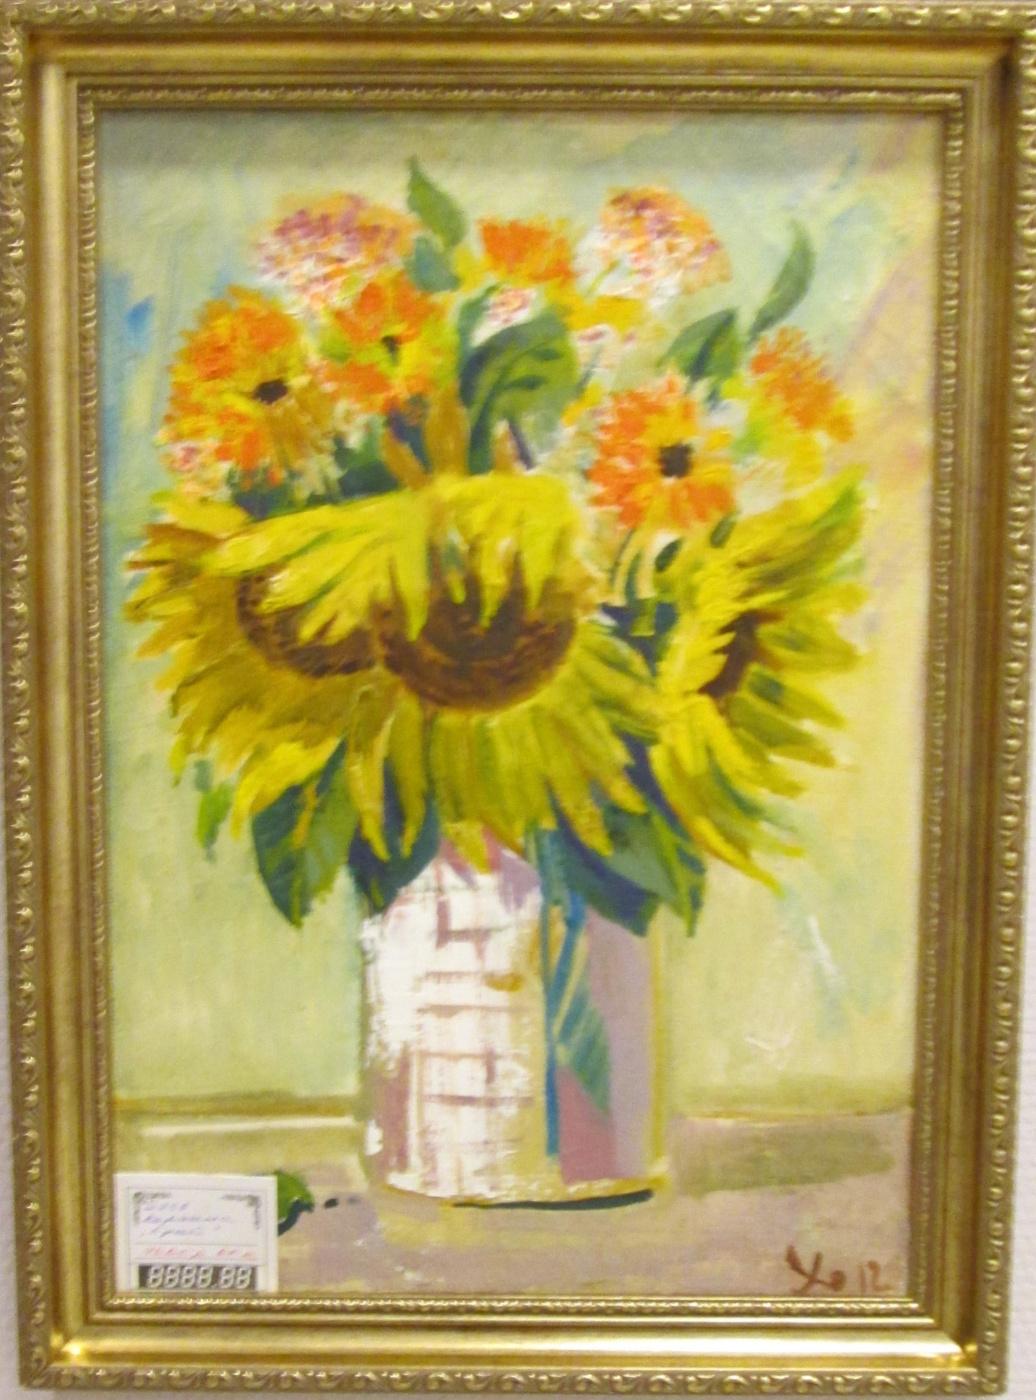 Yuri Ukolov. Bouquet with sunflowers.